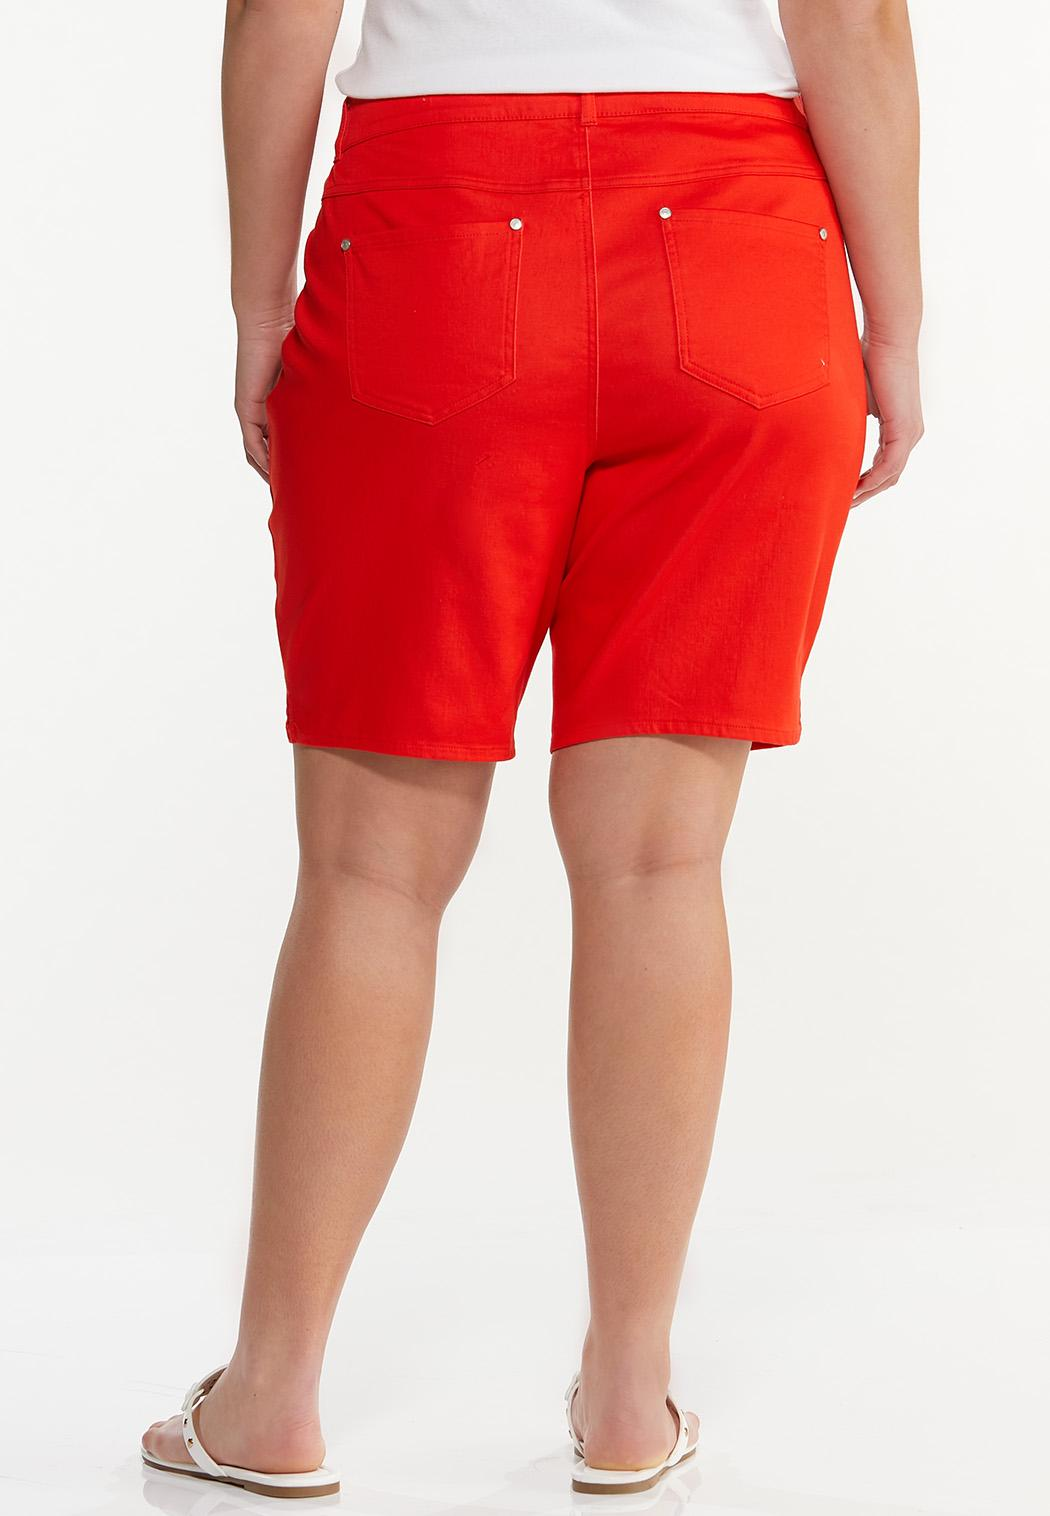 Plus Size Red Denim Shorts (Item #44552343)